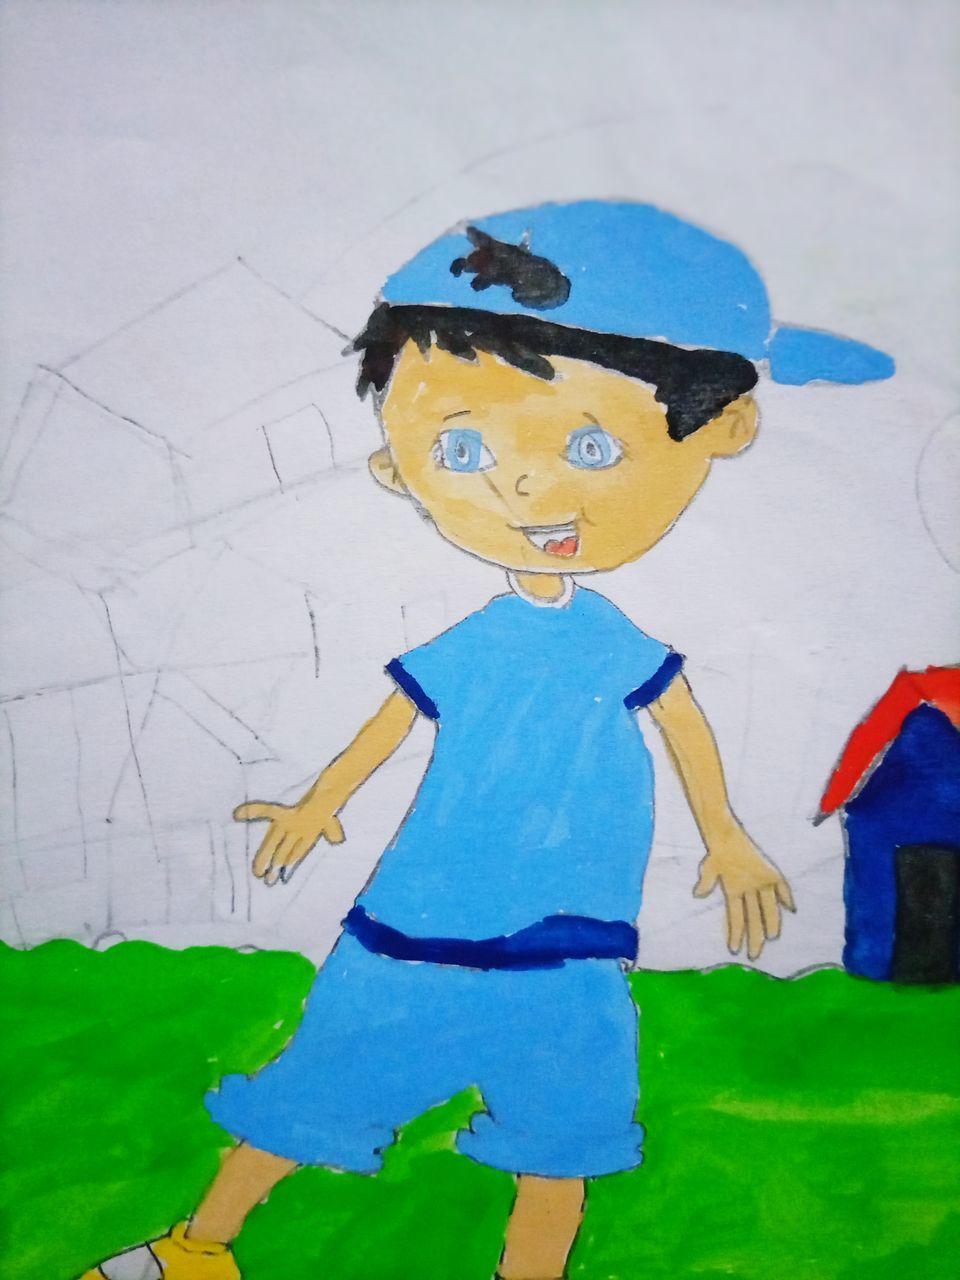 FULL LENGTH OF BOY STANDING ON GREEN PAPER